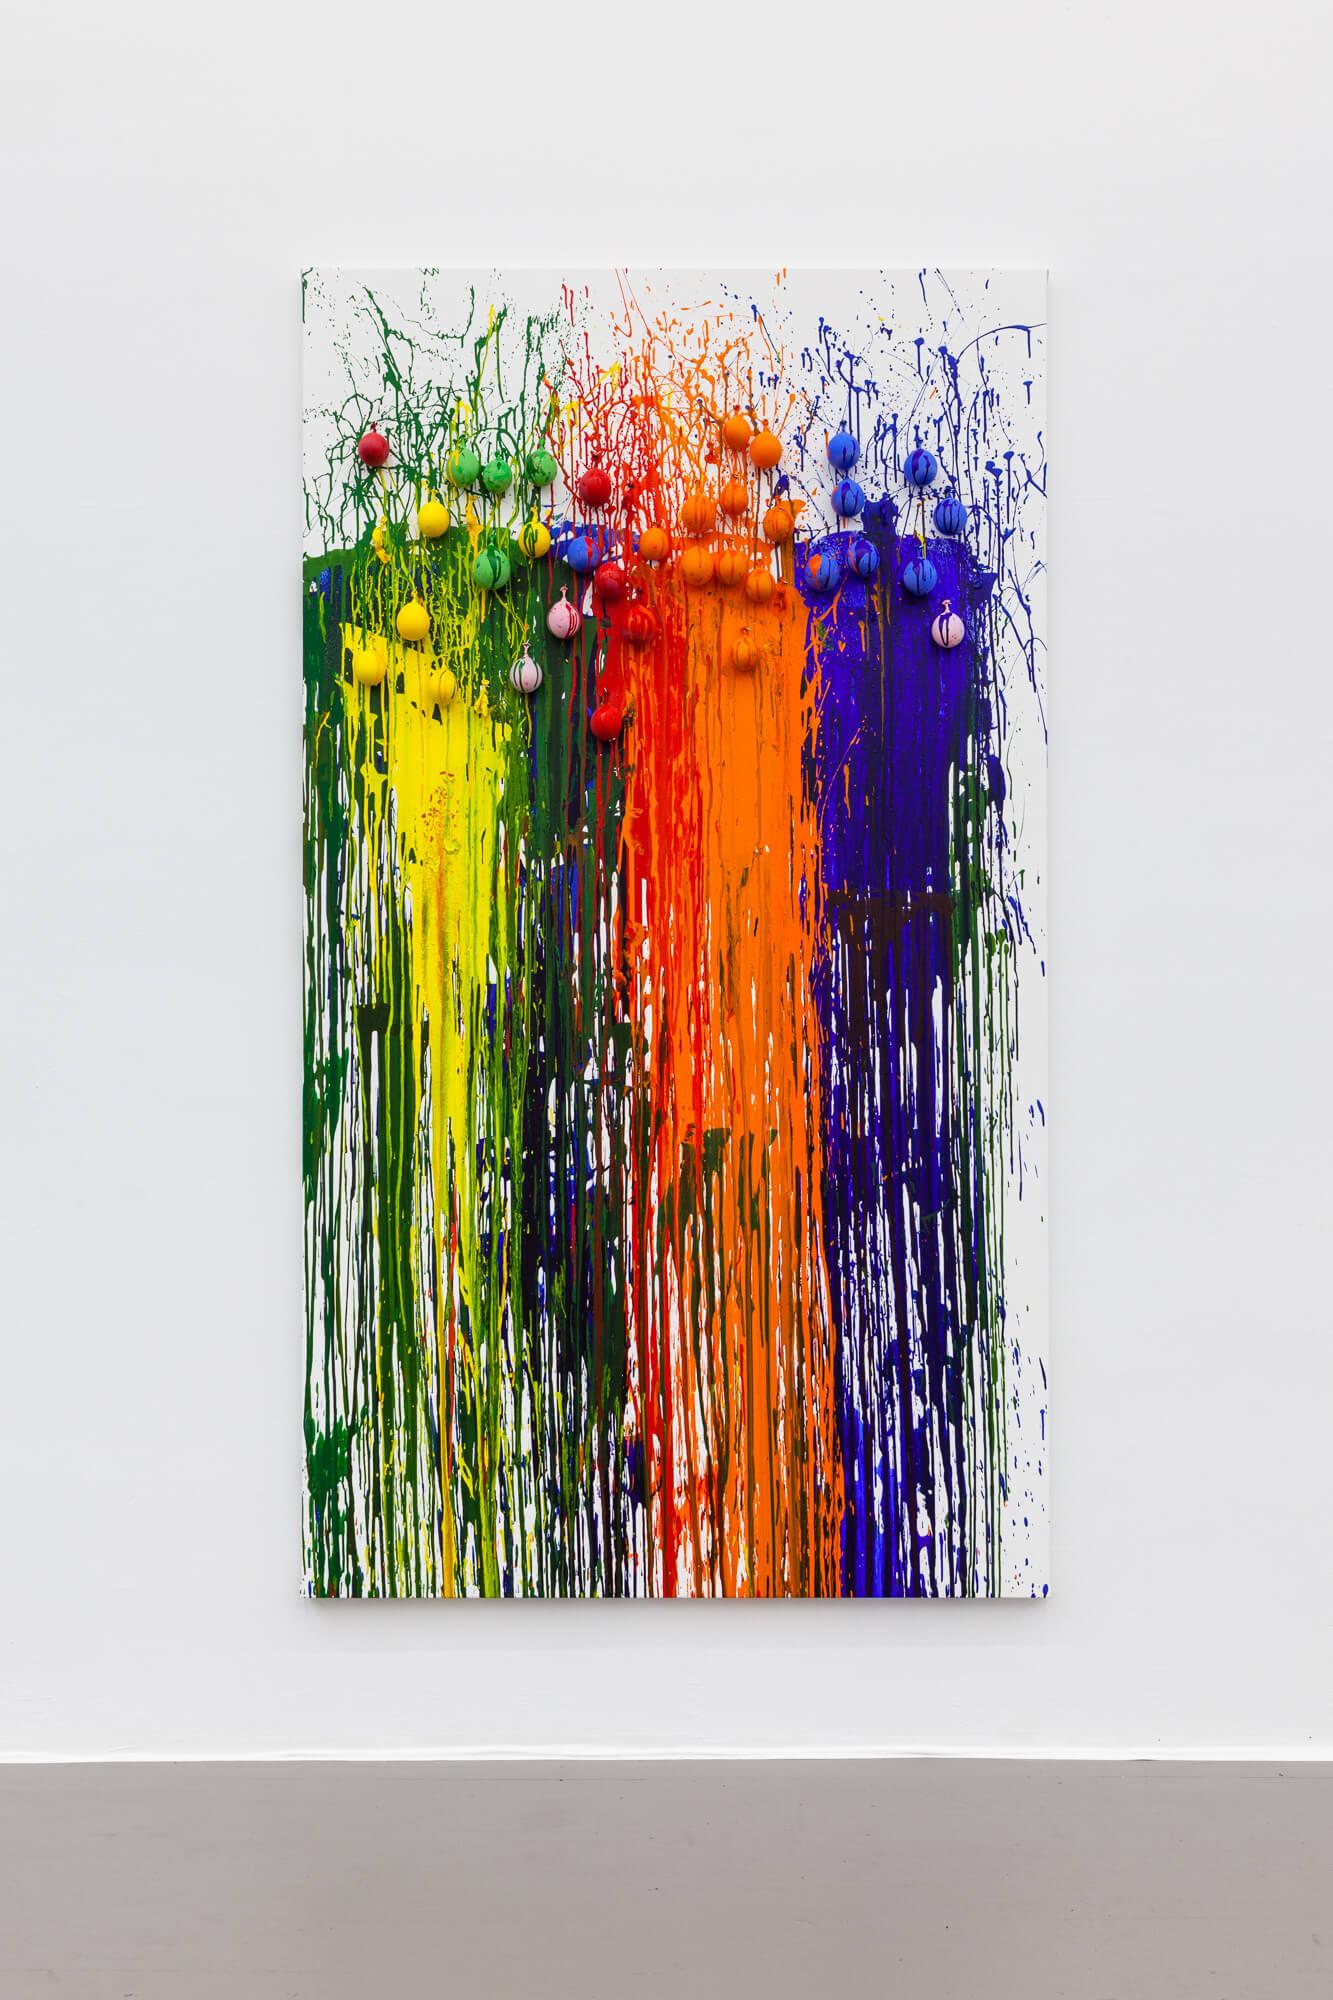 Fade In Int Art Gallery Day Swiss Institute